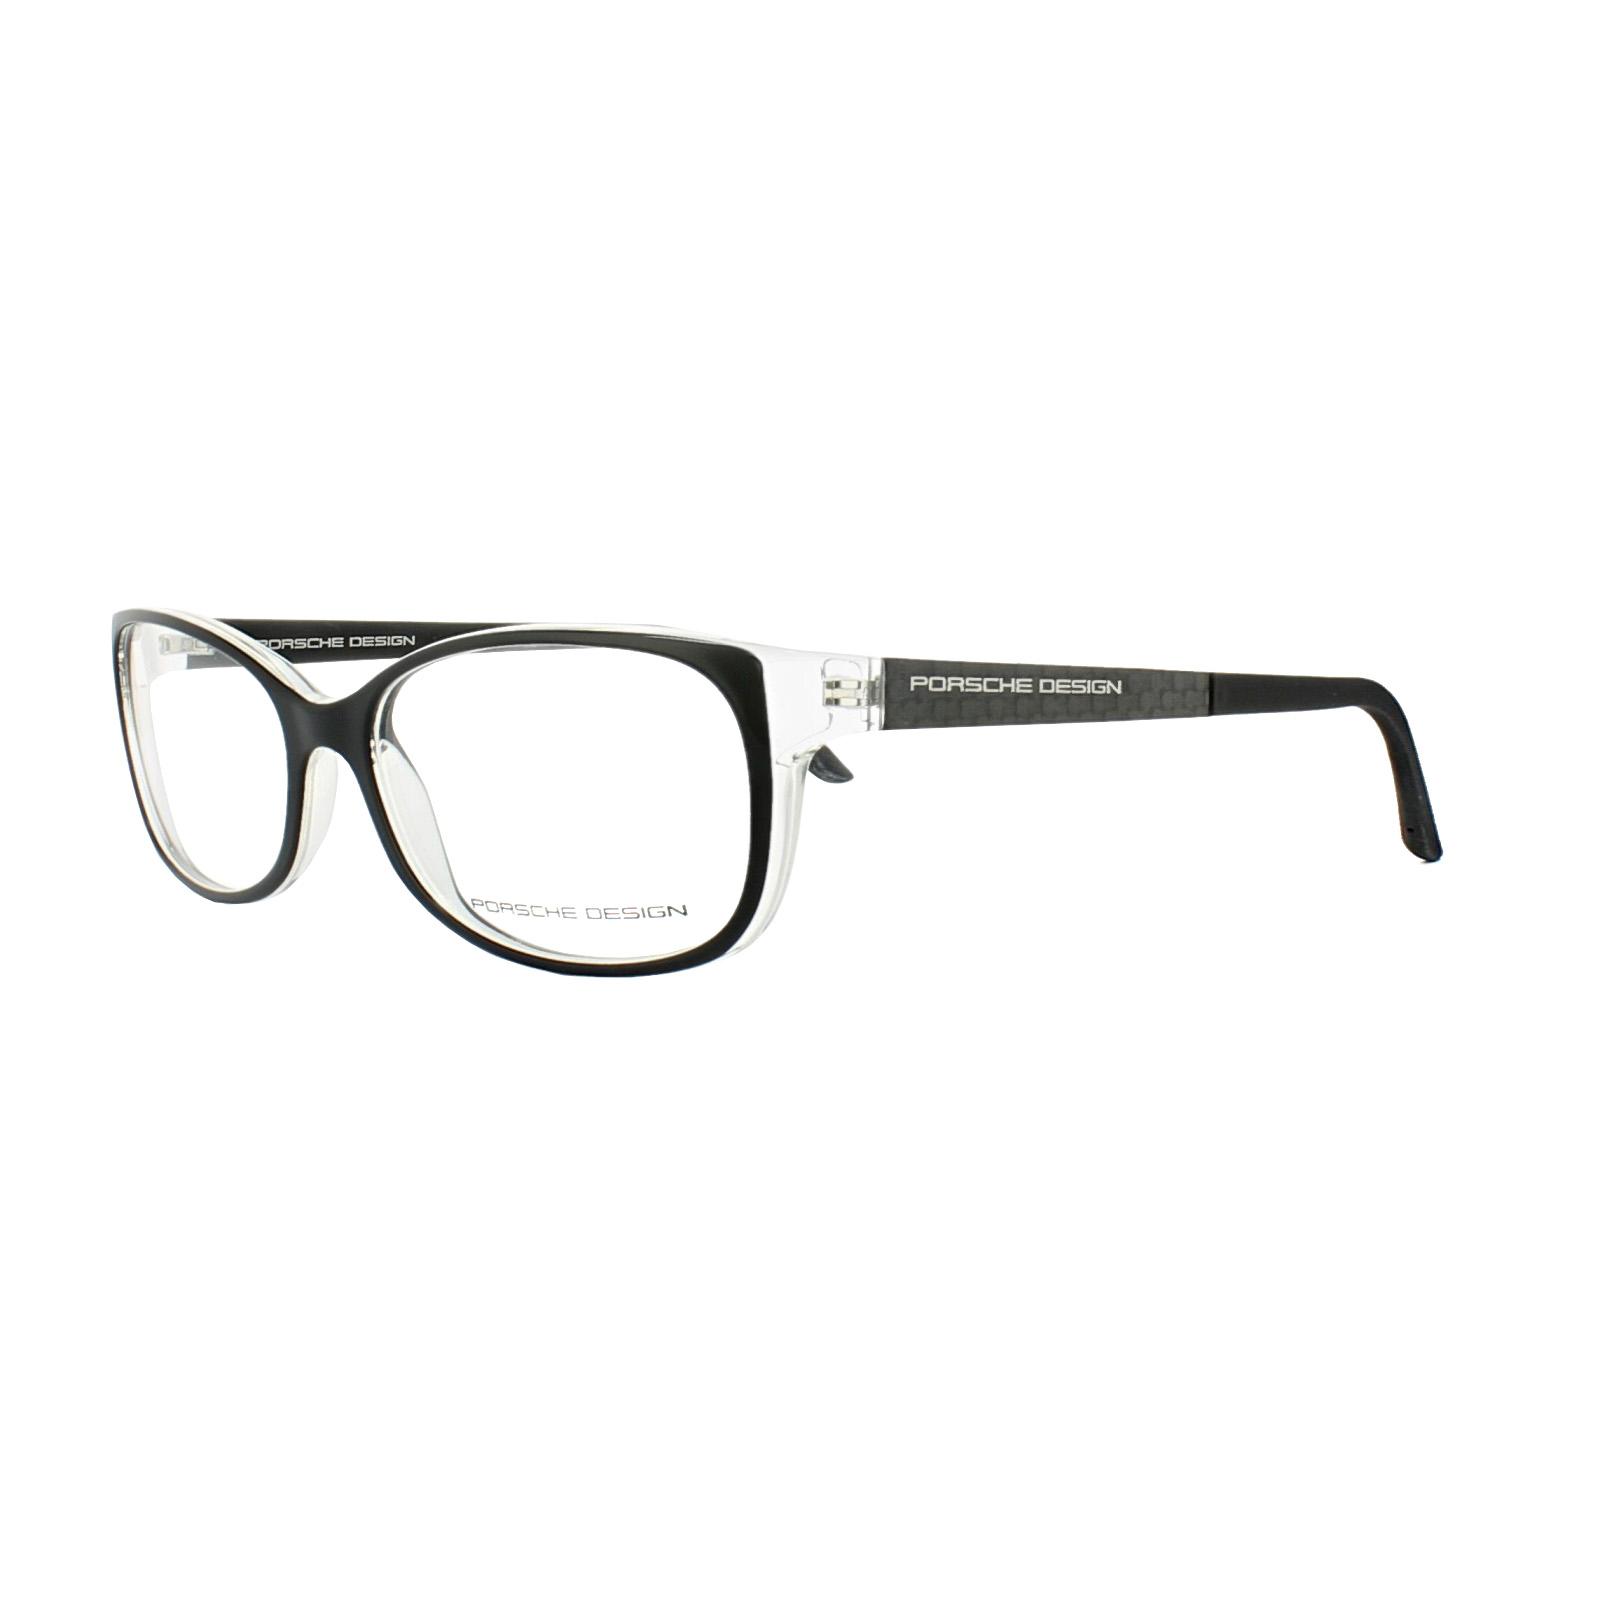 060d5a1f77a Porsche Design Glasses Frames P8247 A Black on Crystal 4046901717216 ...